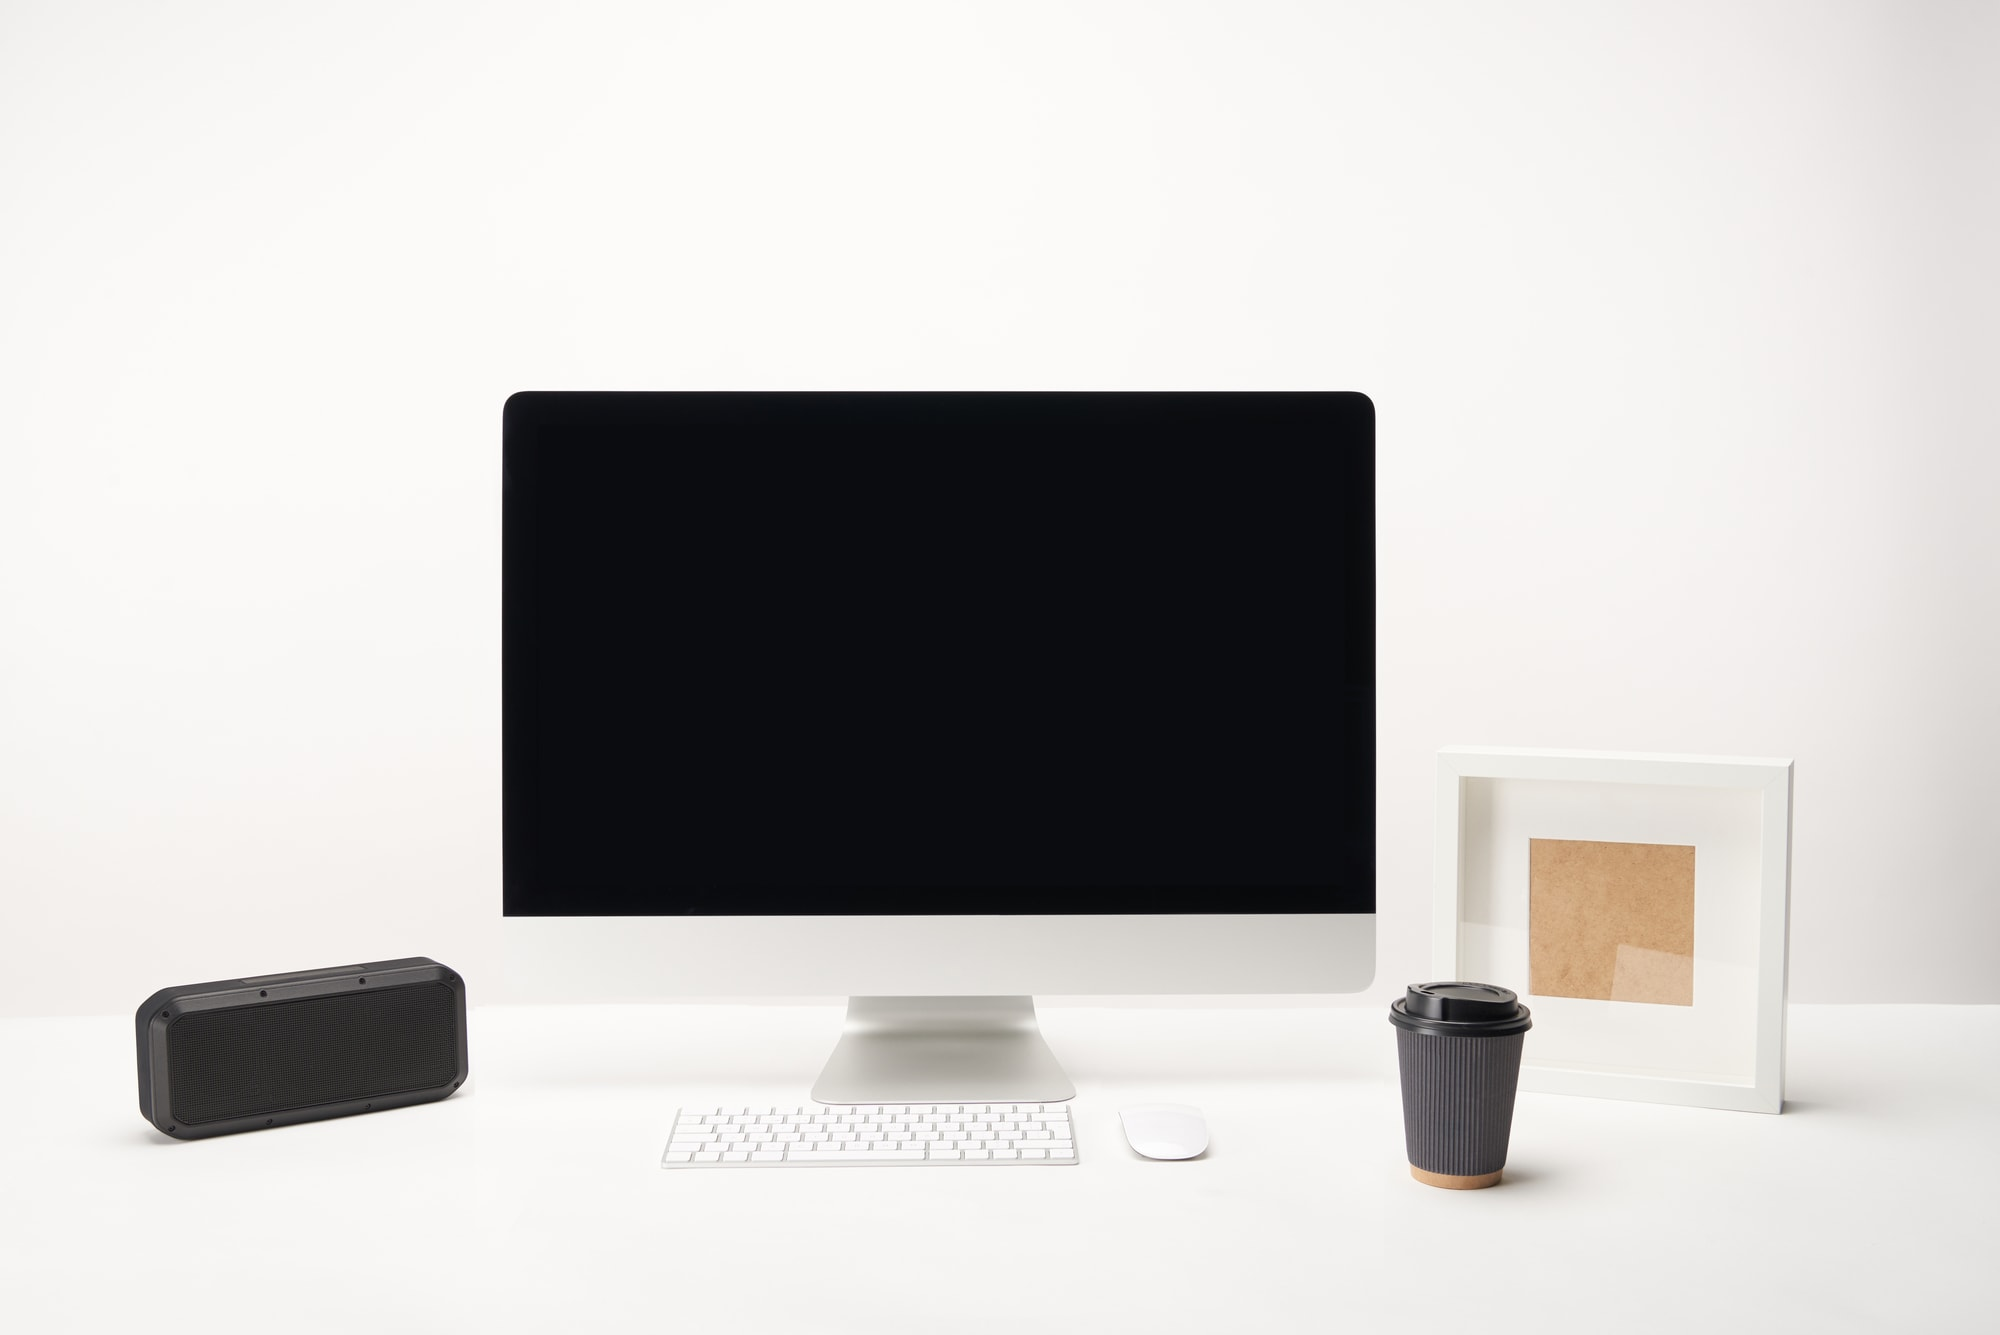 desktop-clean-min.jpg